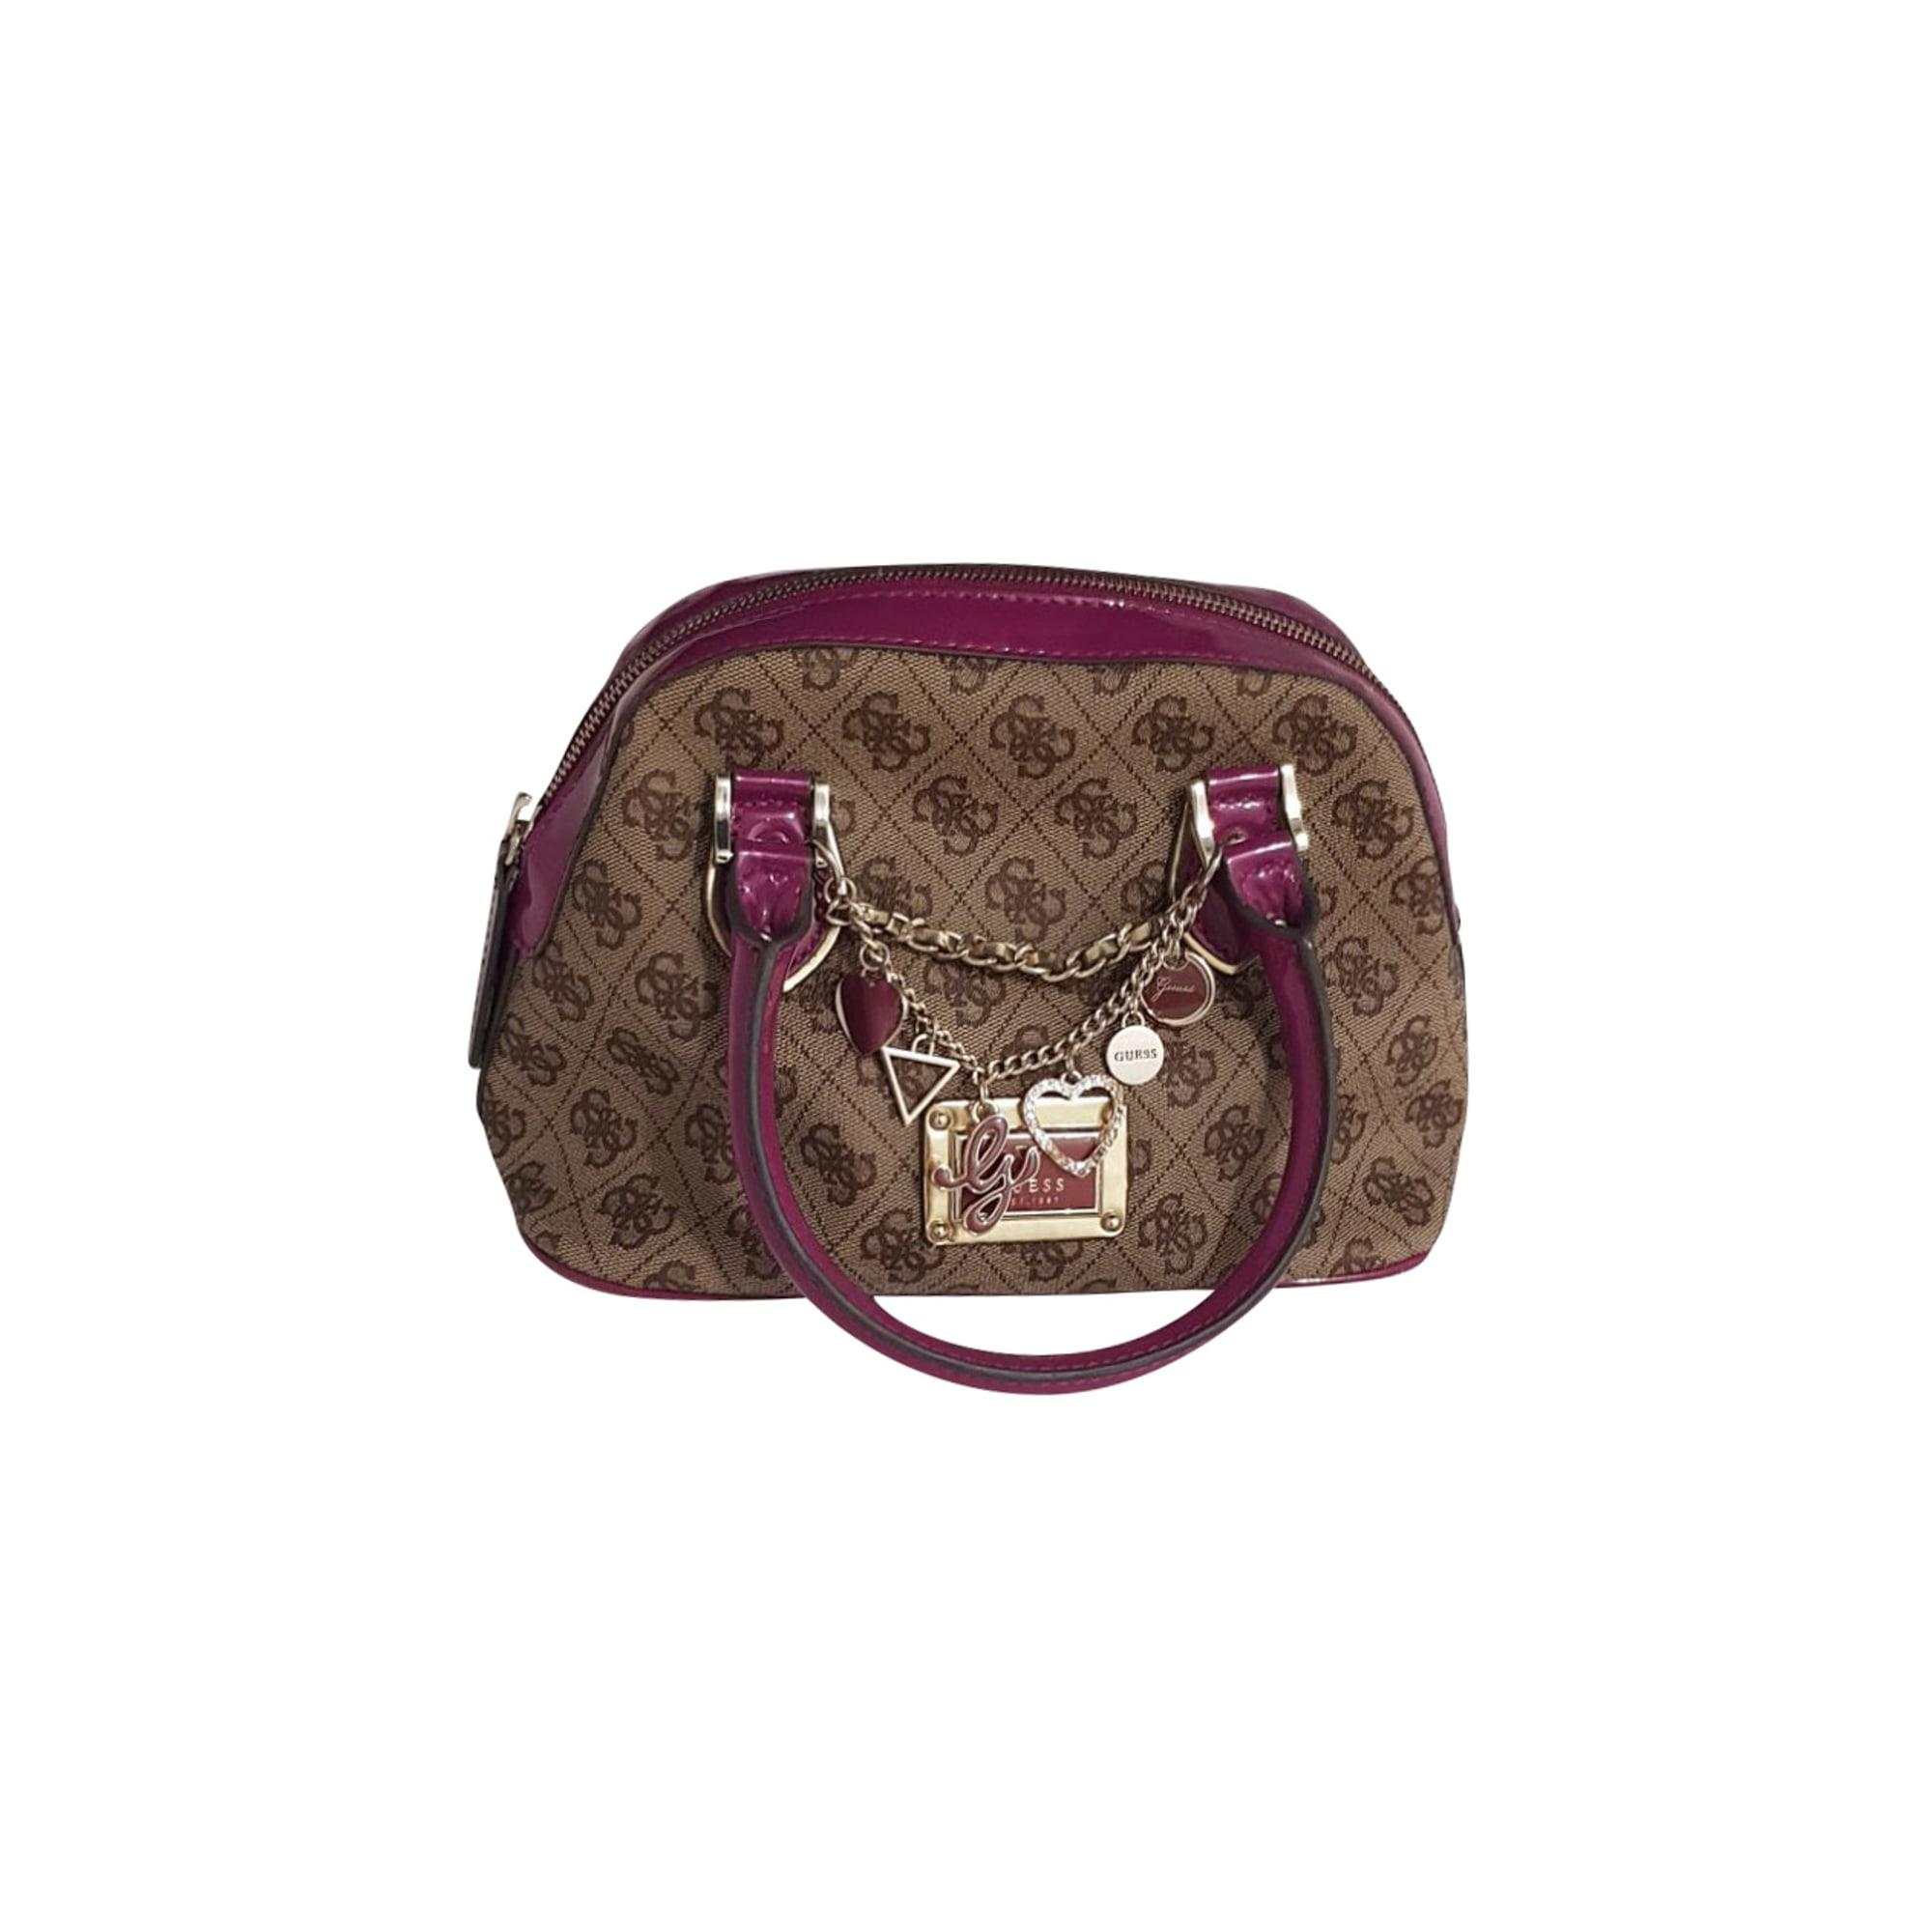 Lederhandtasche GUESS Violett, malvenfarben, lavendelfarben